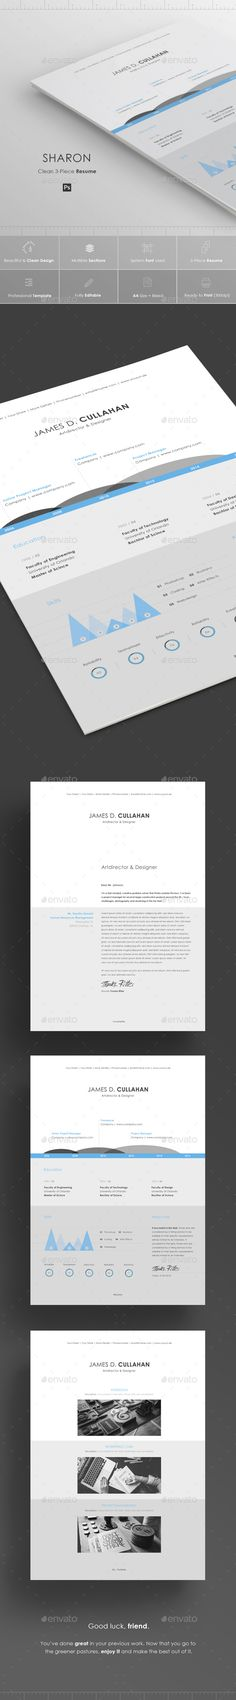 Simple Resume Template Simple resume template, Simple resume and - resume template simple